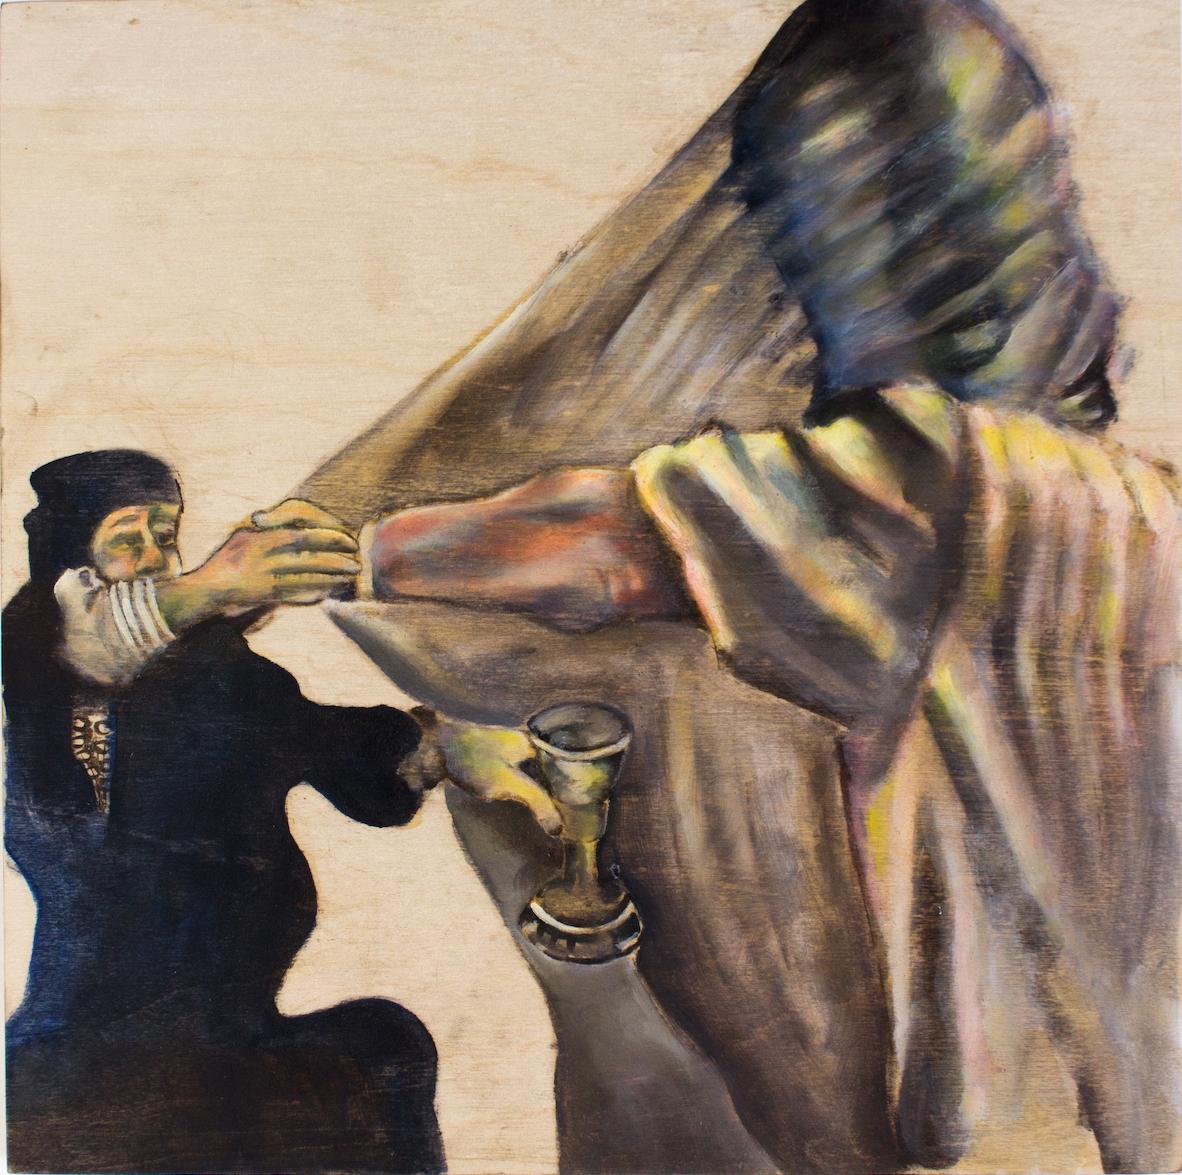 Namrata arjun, performative art, oil on panel